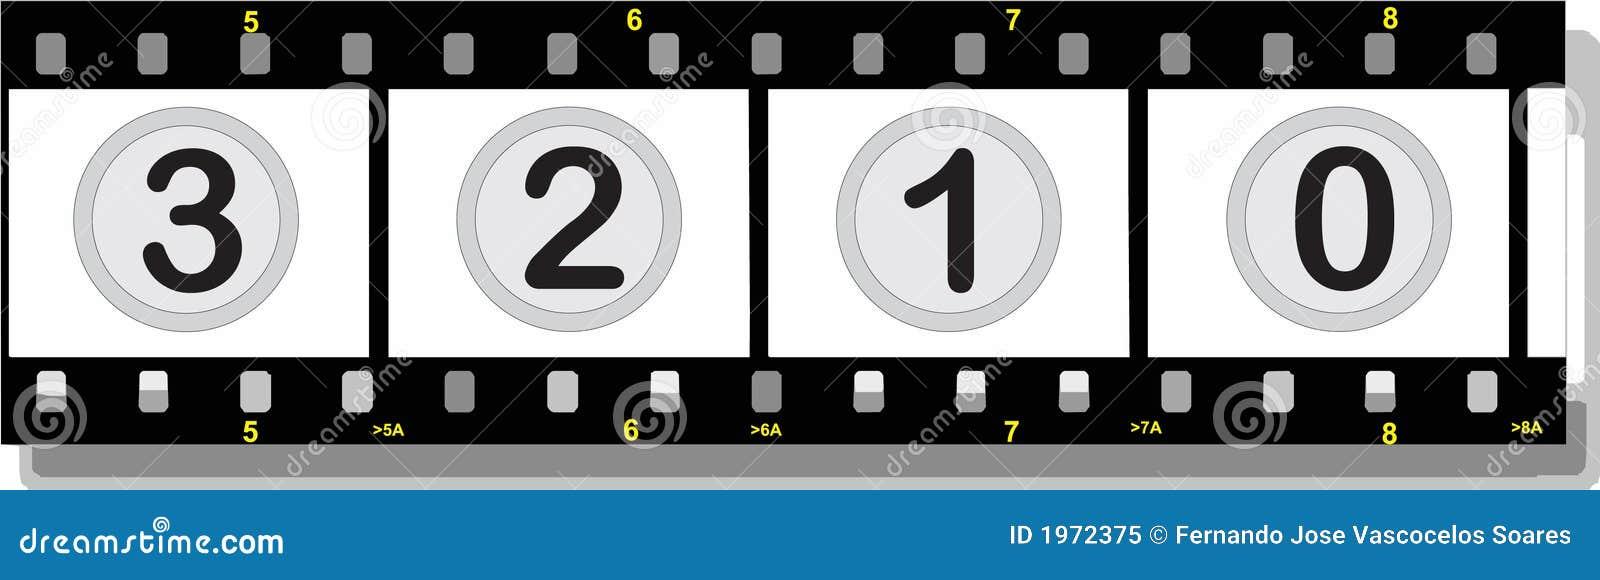 clipart pellicola cinematografica - photo #41